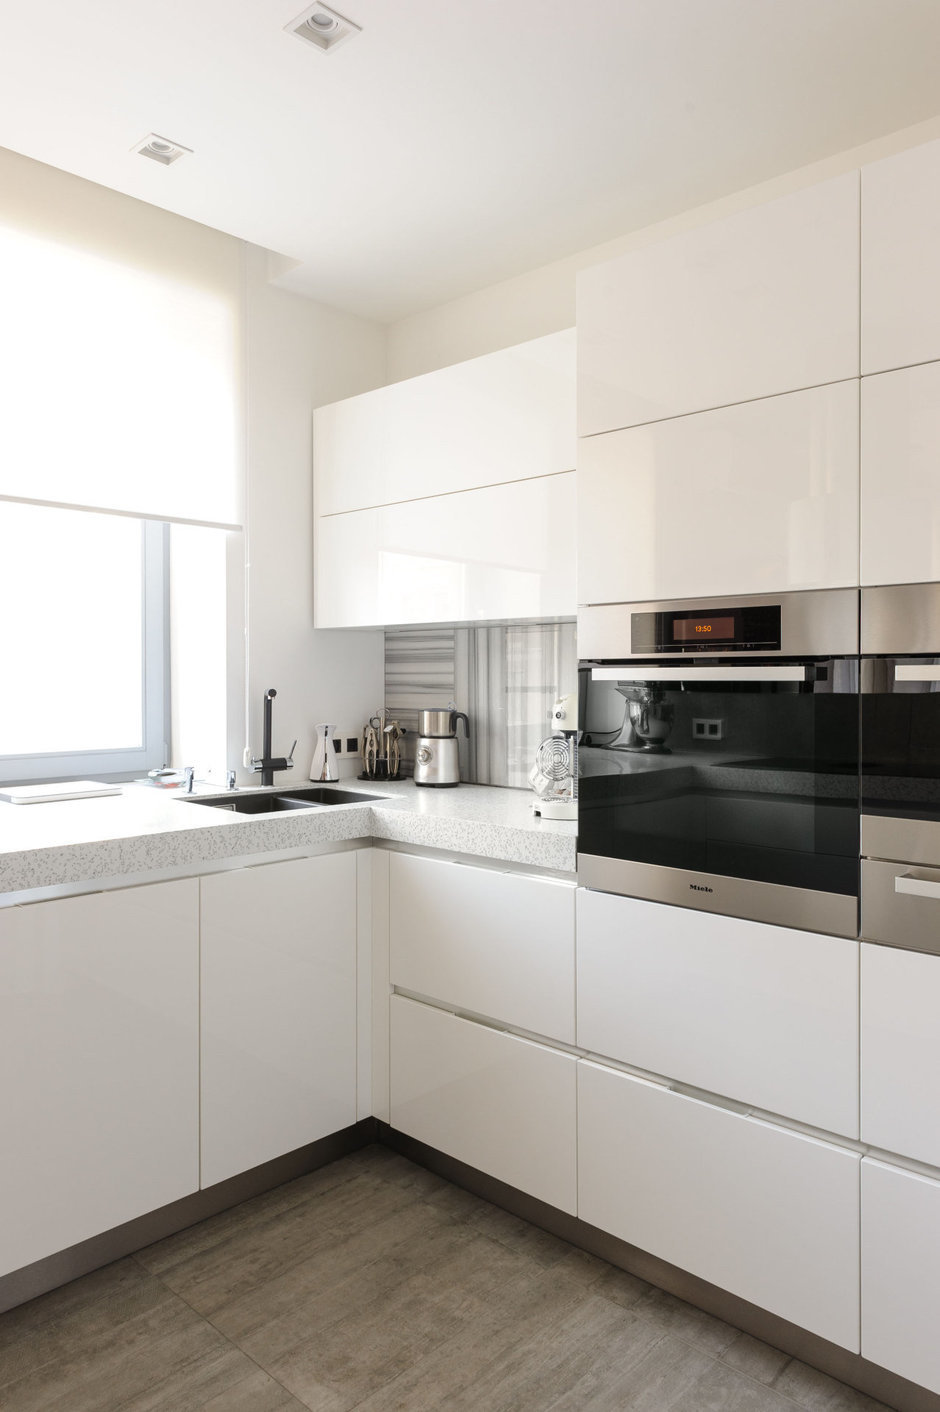 Фотография: Кухня и столовая в стиле Хай-тек, Лофт, Квартира, Дома и квартиры, Проект недели, Поп-арт – фото на InMyRoom.ru